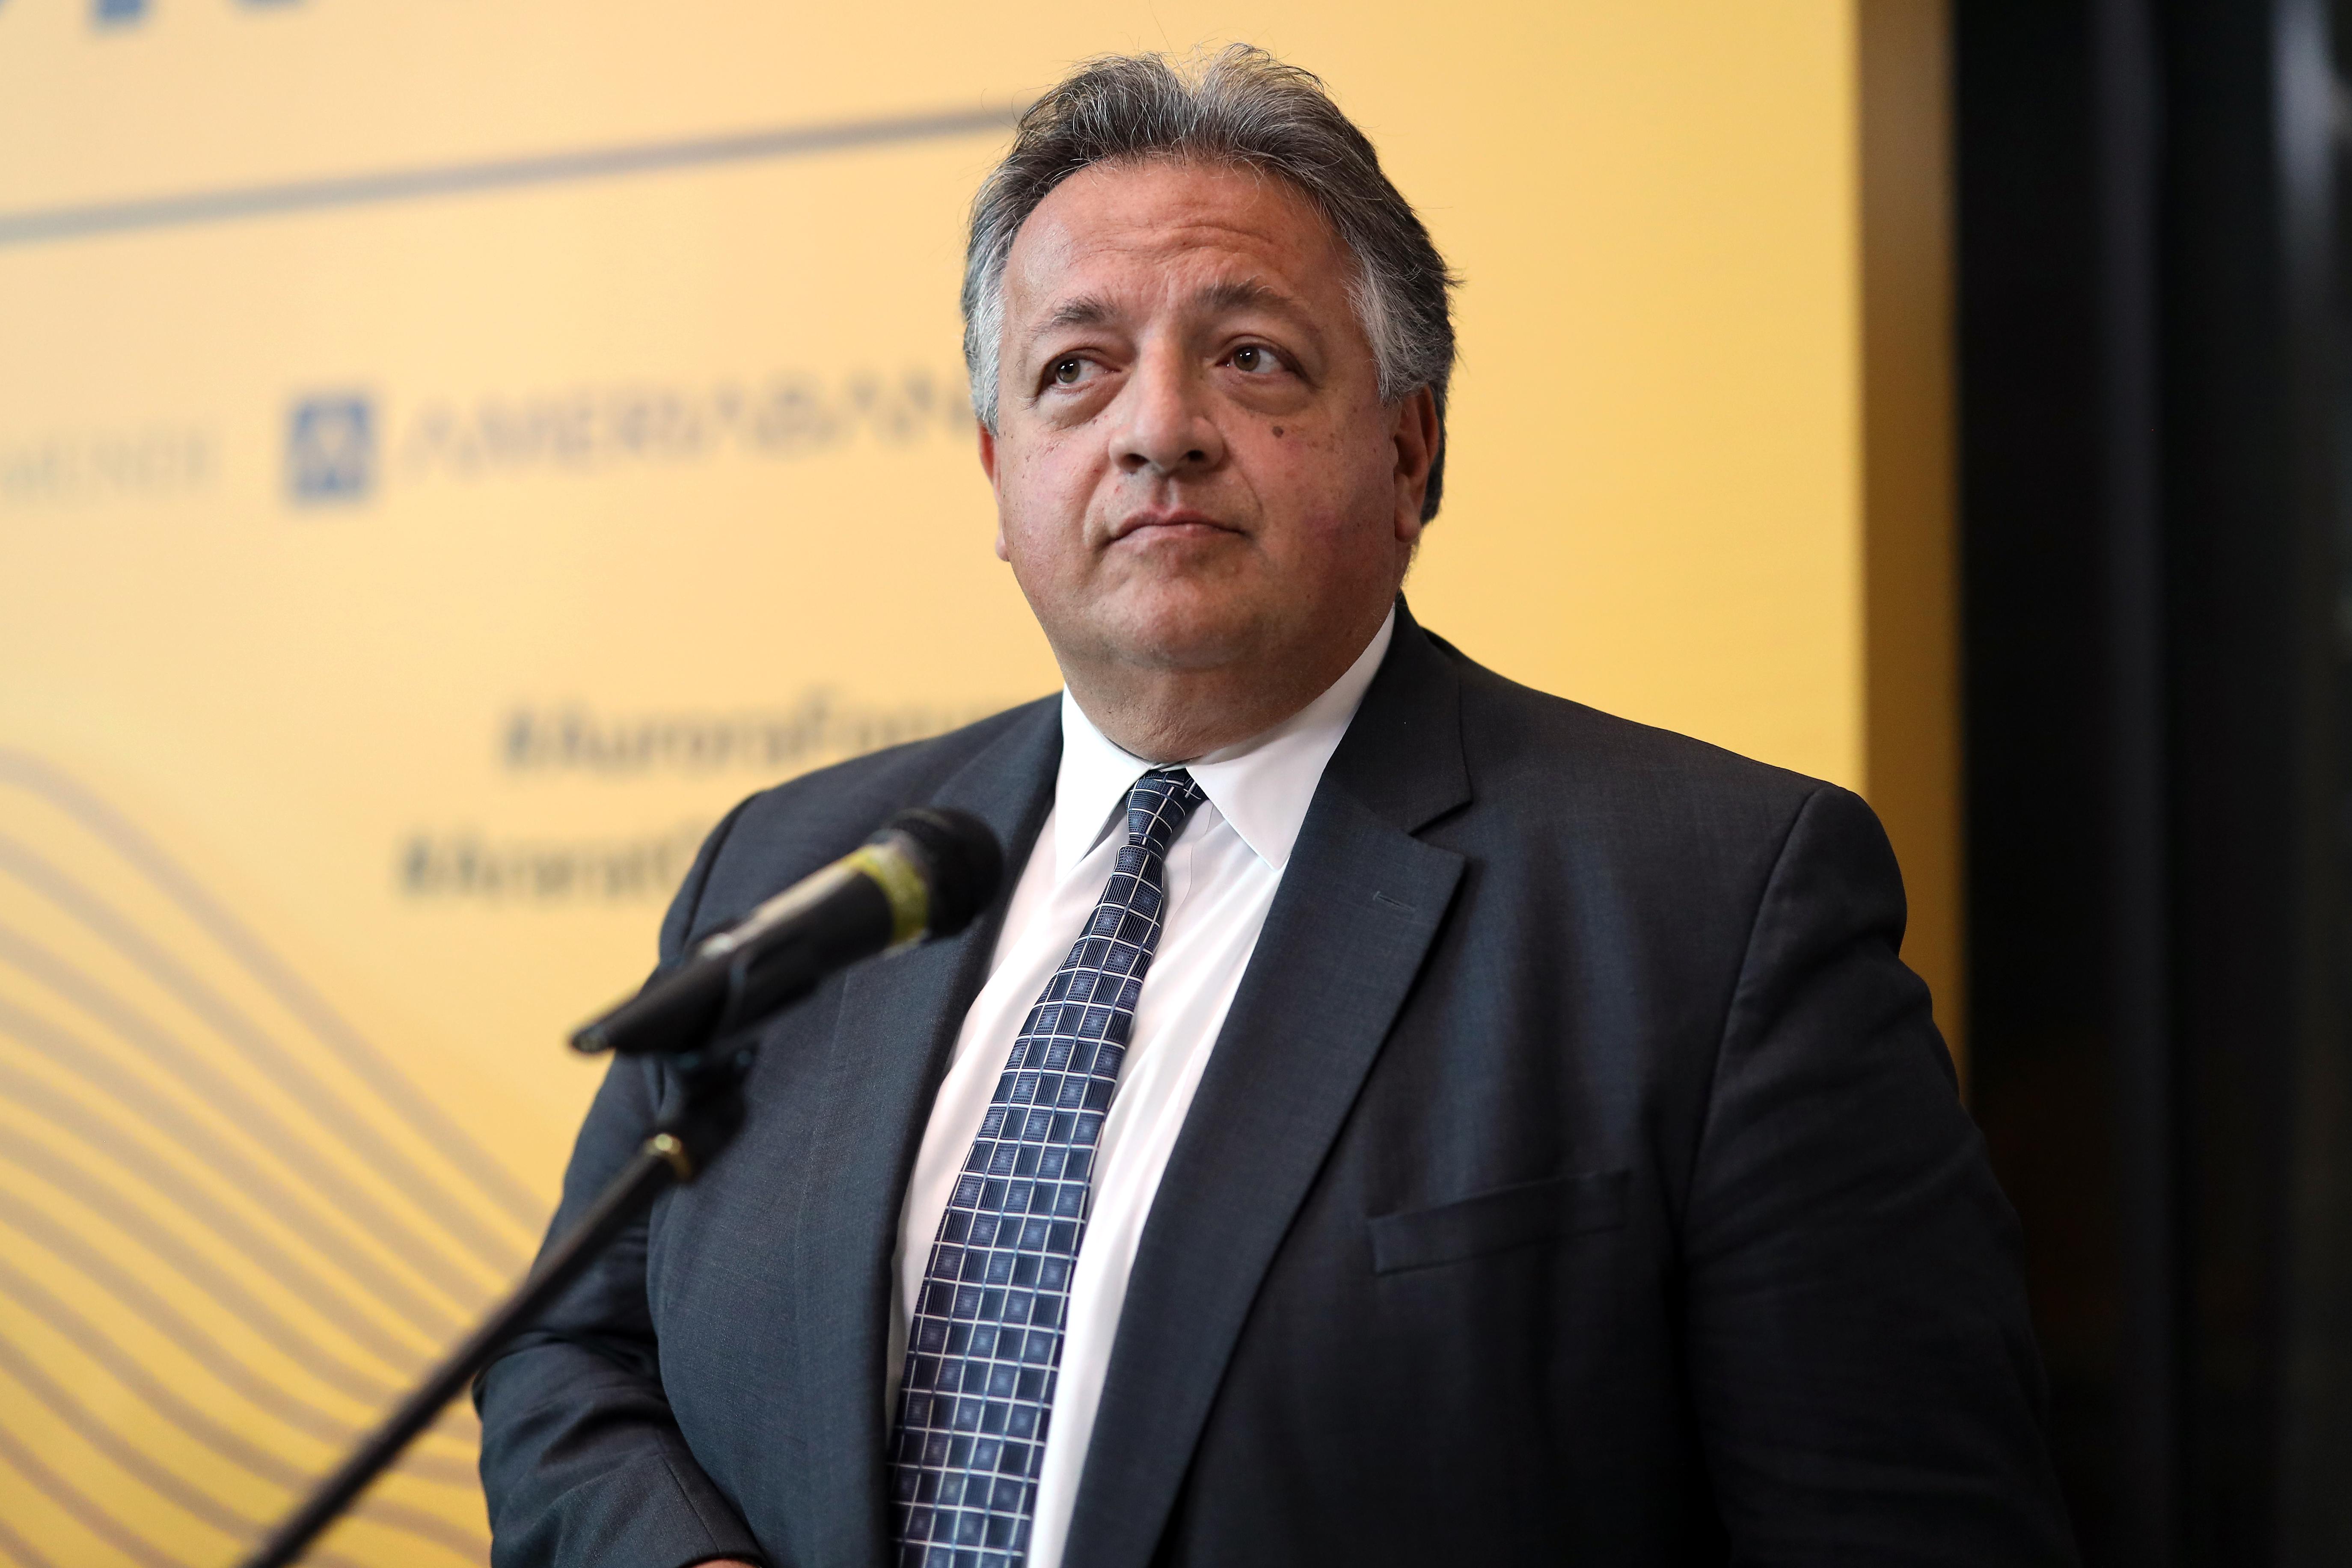 Noubar Afeyan speaks at the 2019 Aurora Forum on October 16, 2019 in Yerevan, Armenia.